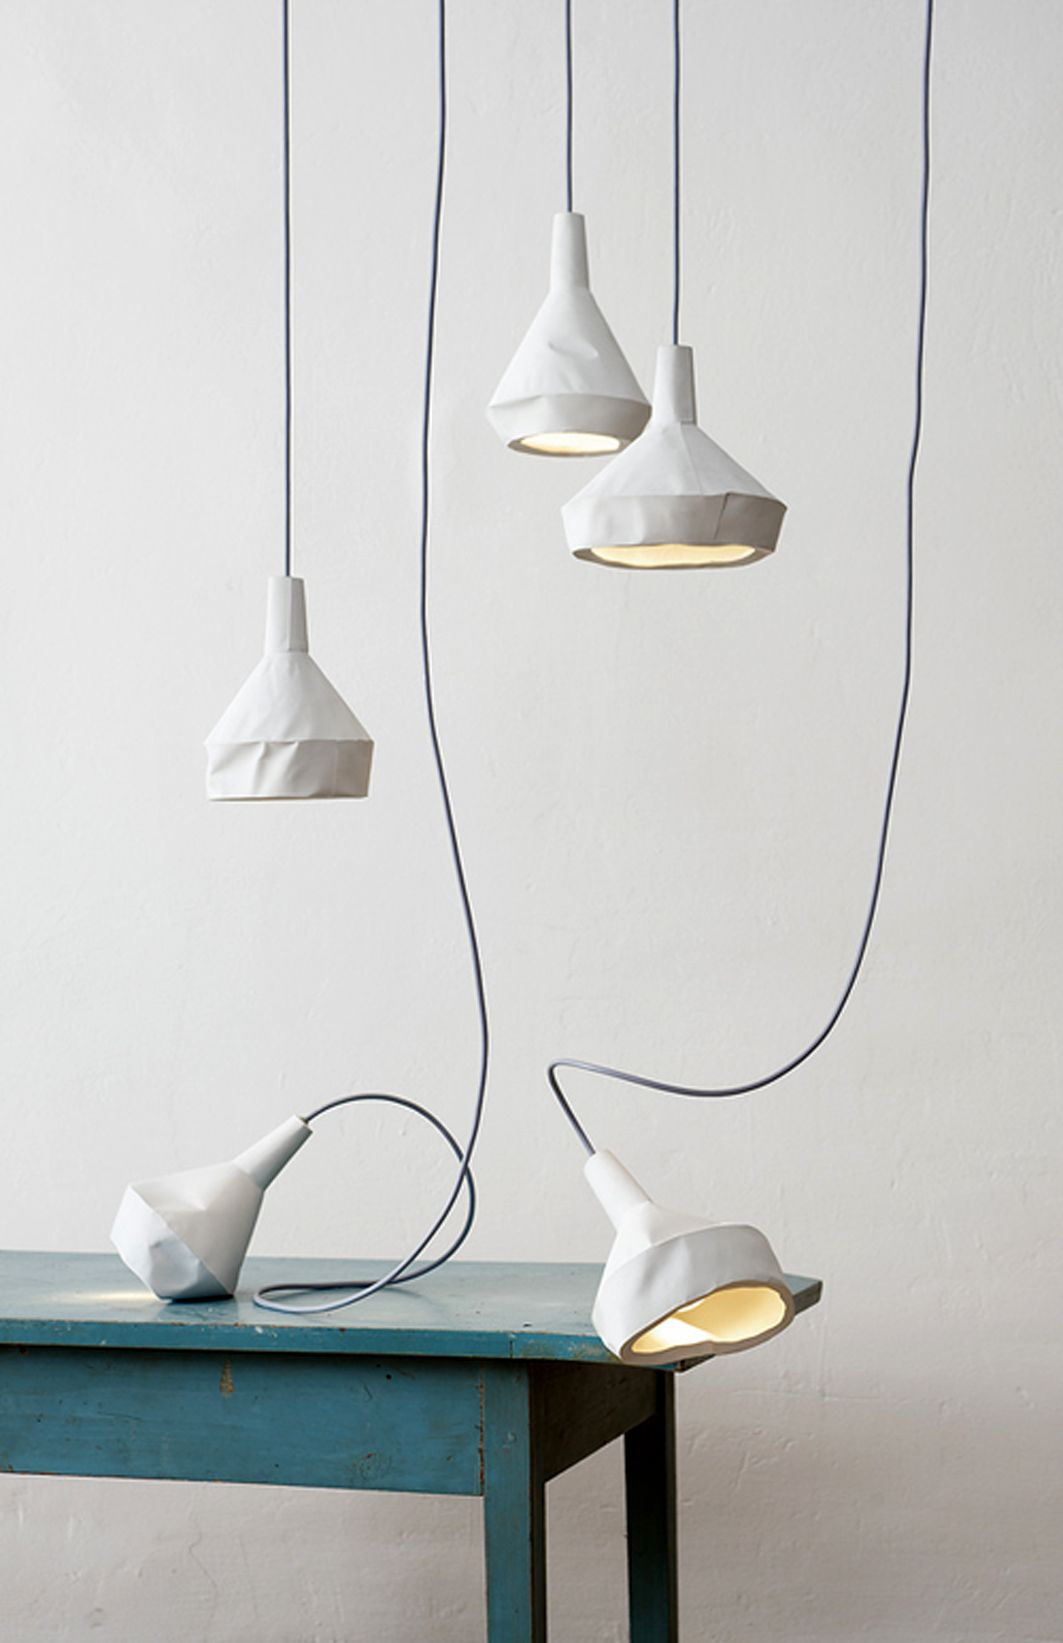 Amelung By Paper Lamp Austamp; DesignLike Miriam Sebastian Lighting TclF1J3K